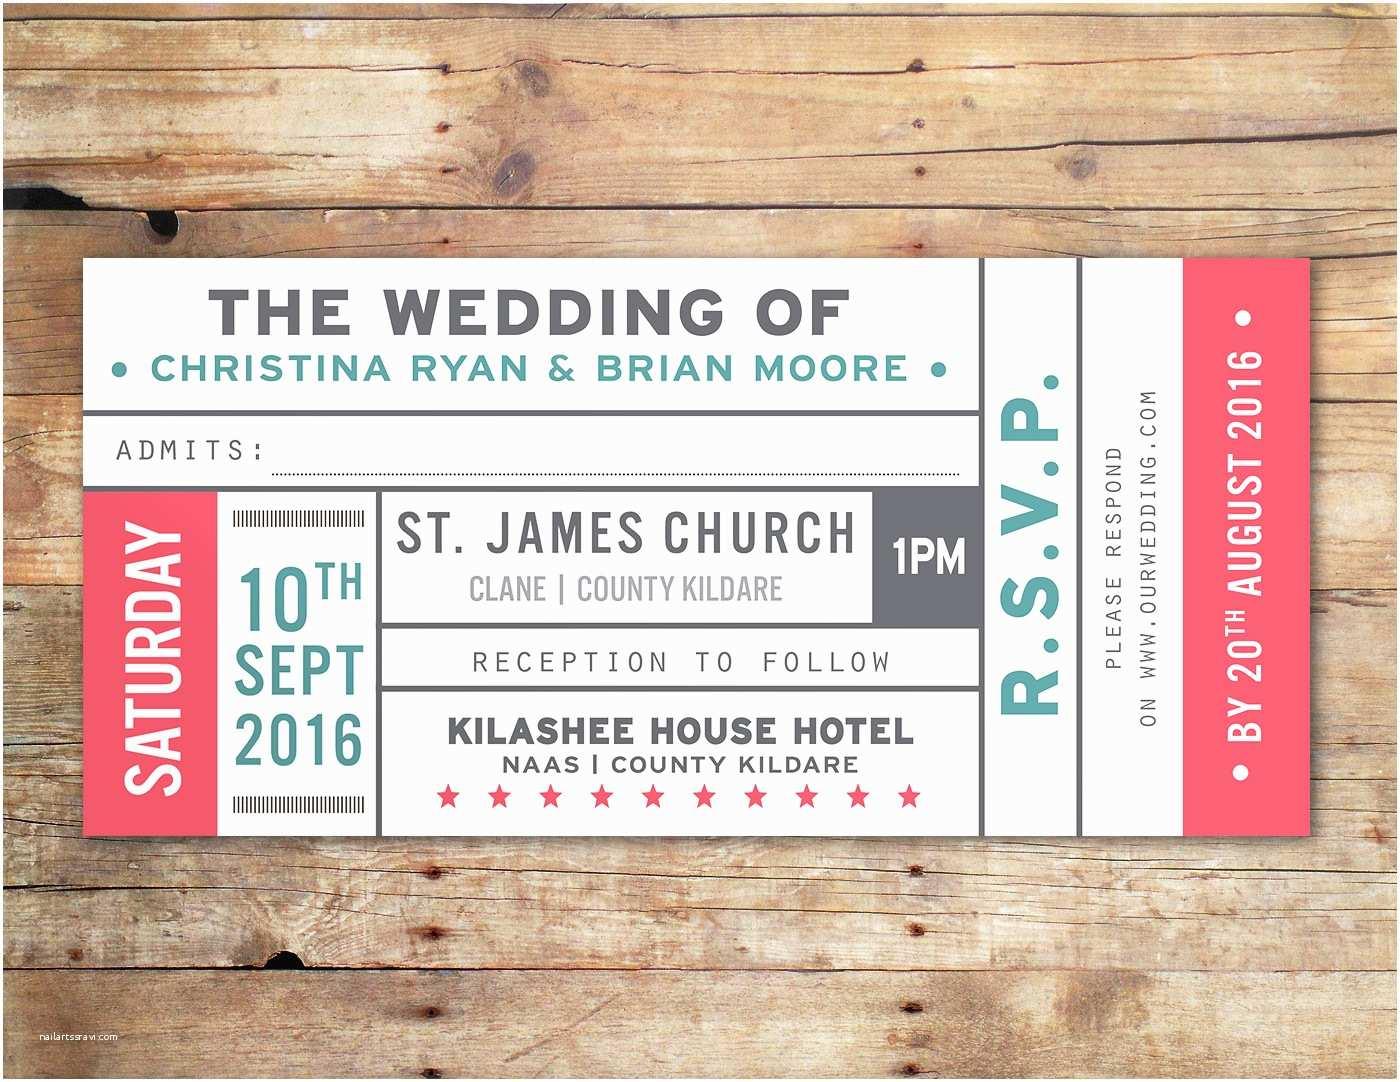 Wedding Invitations that Look Like Tickets Vintage Ticket Wedding Invitations Uk & Ireland